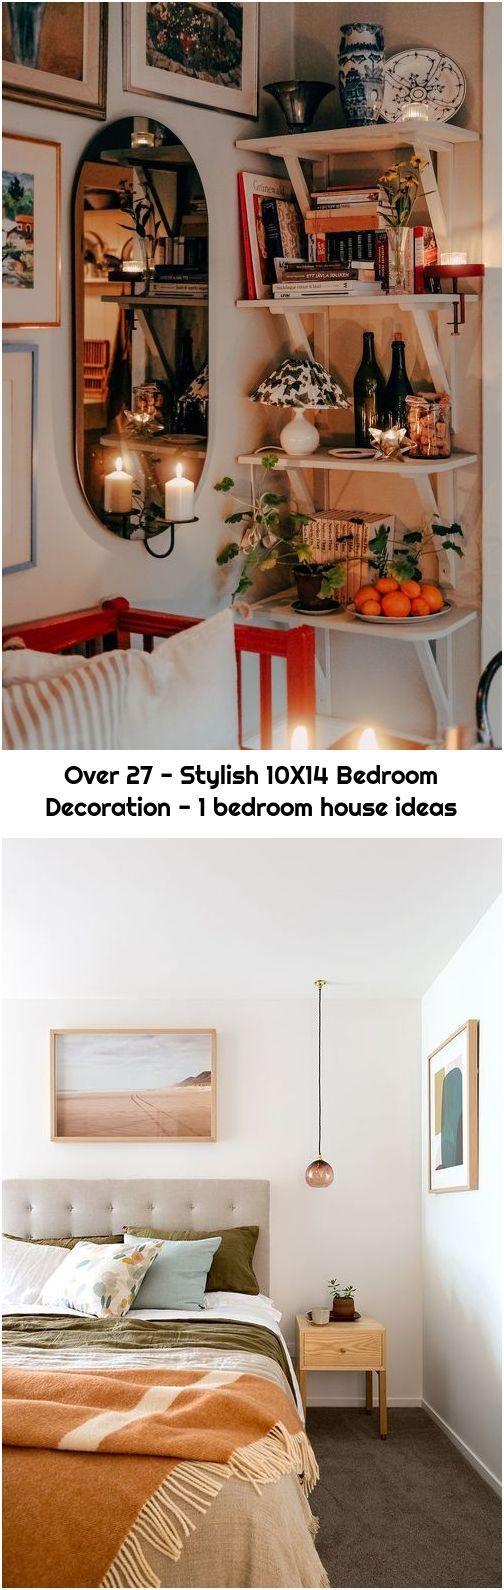 Over 27 Stylish 10x14 Bedroom Decoration 1 Bedroom House Ideas Bedroom Decor 1 Bedroom House Decor